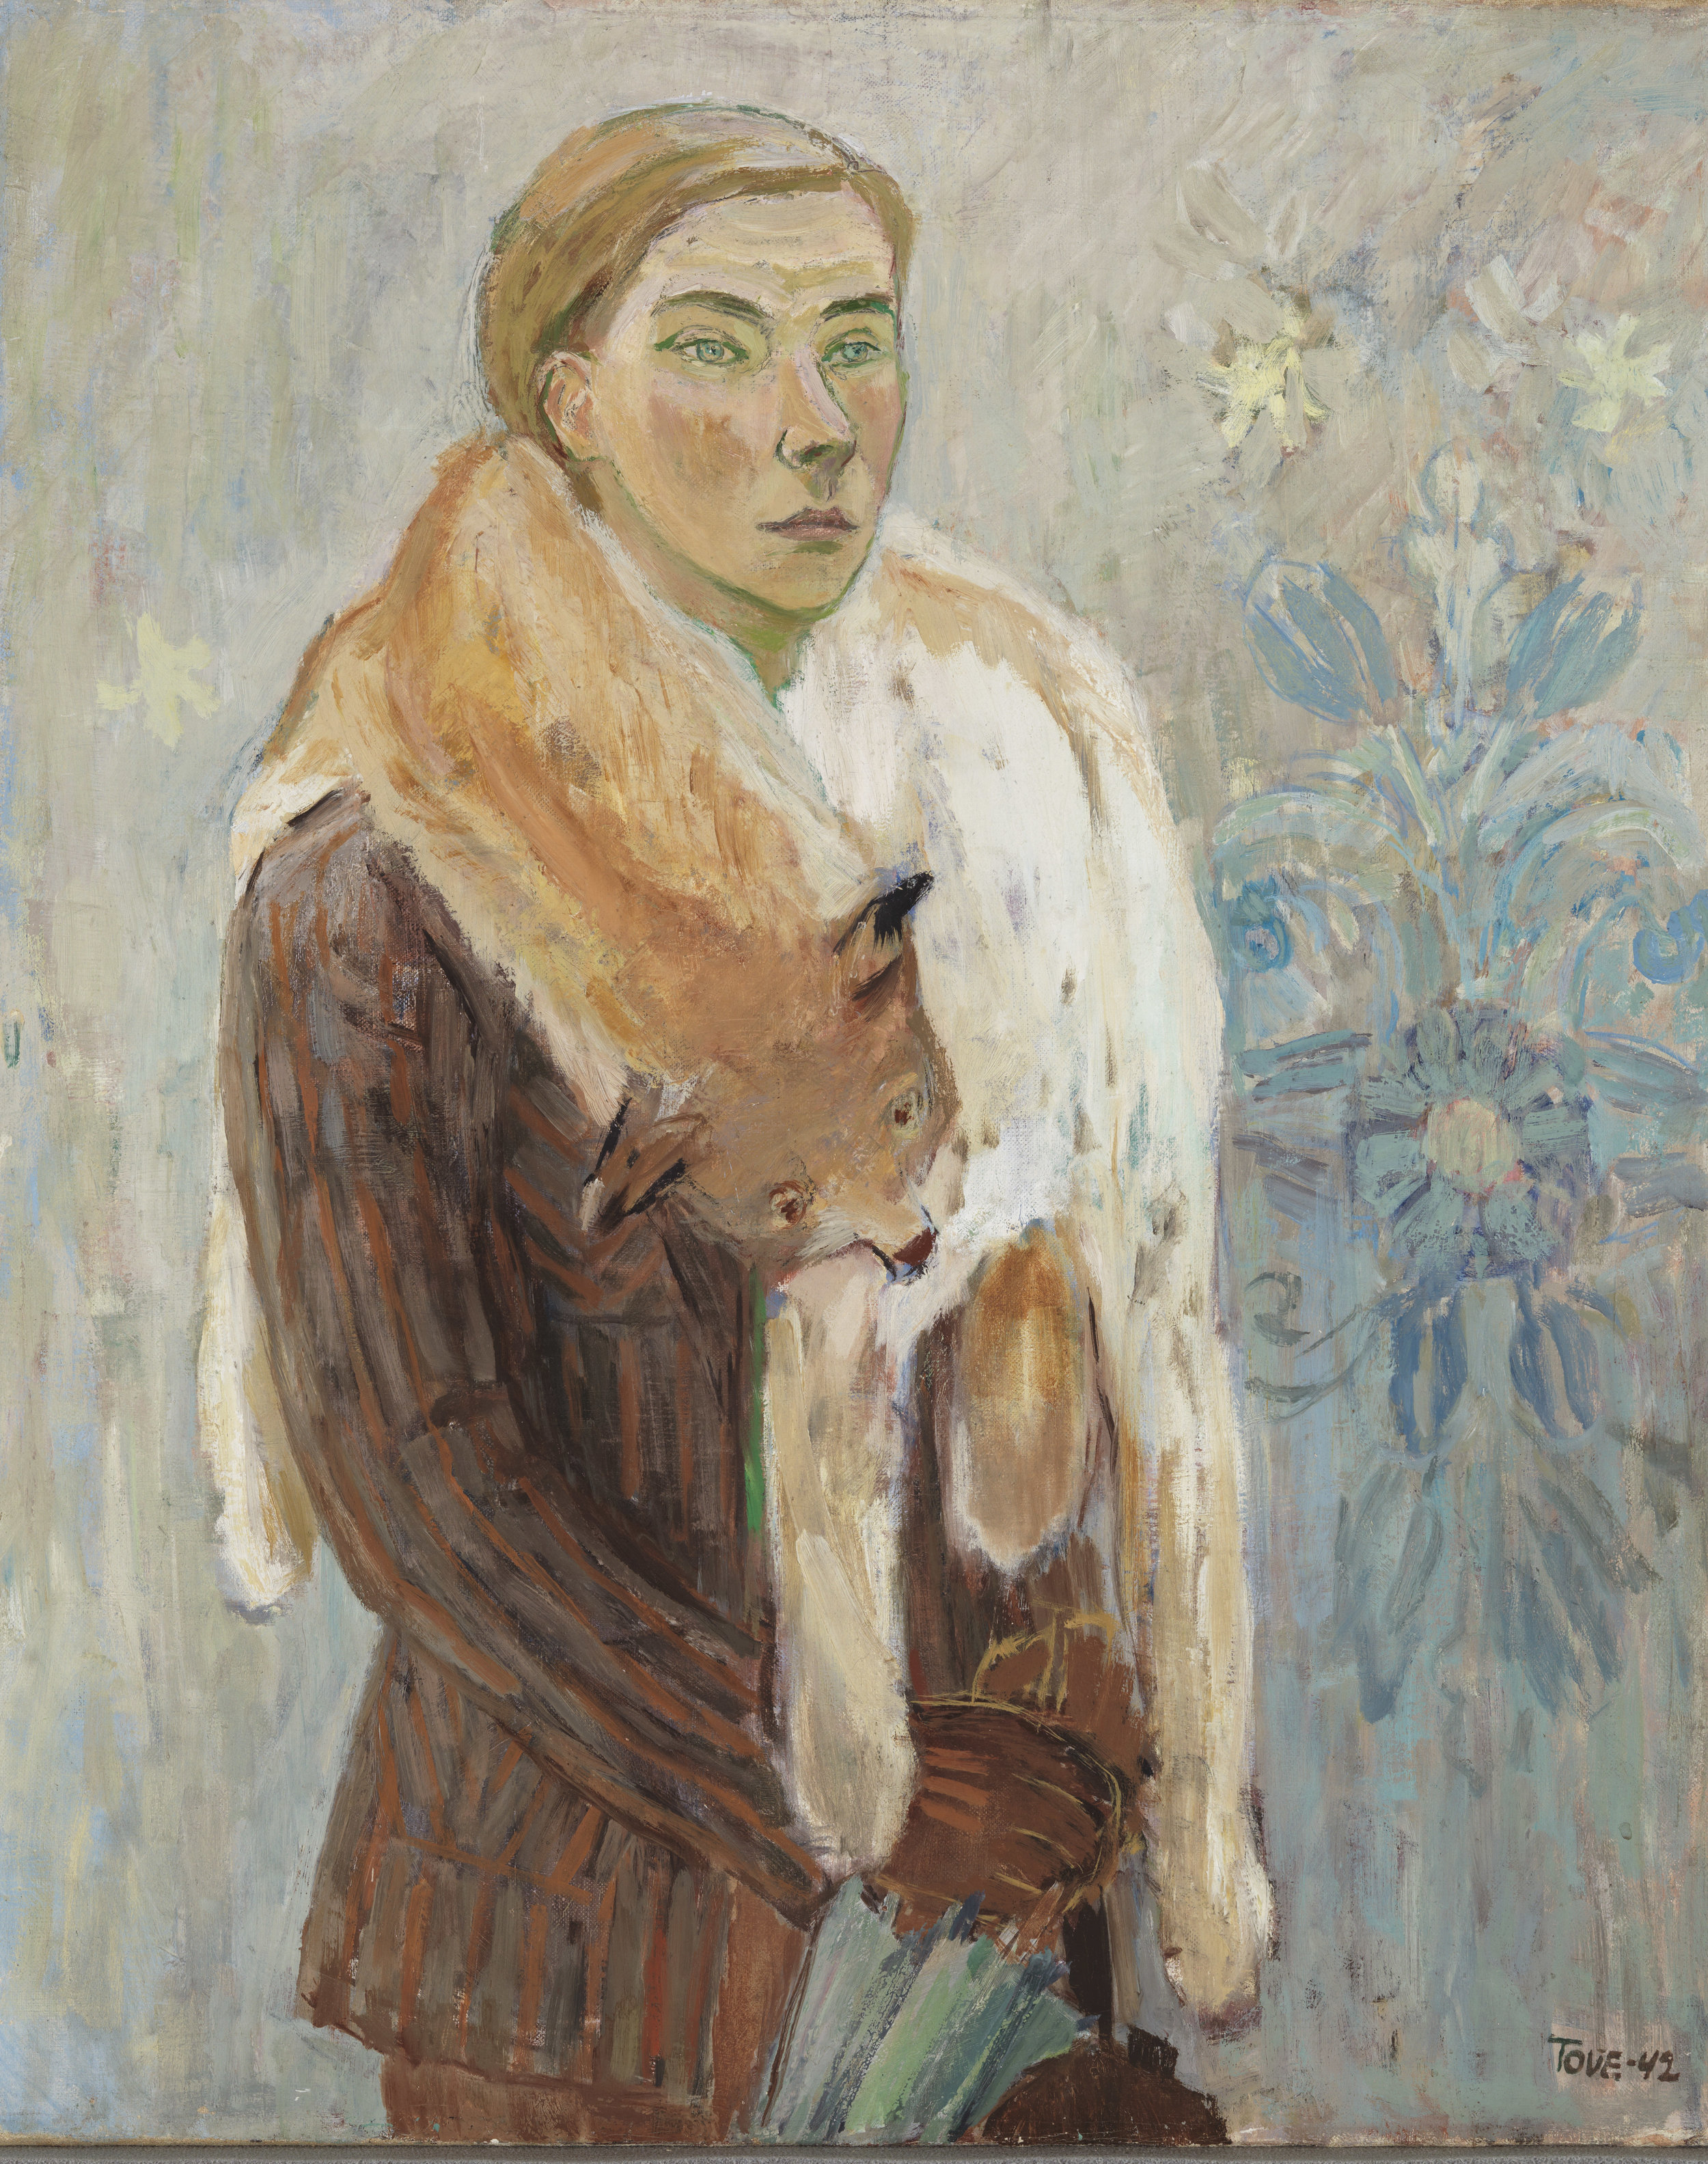 Loboan (Selvportraet) , Tove Jansson, 1942. Billede: Finlands Nationalgalleri, Yehia Eweis.